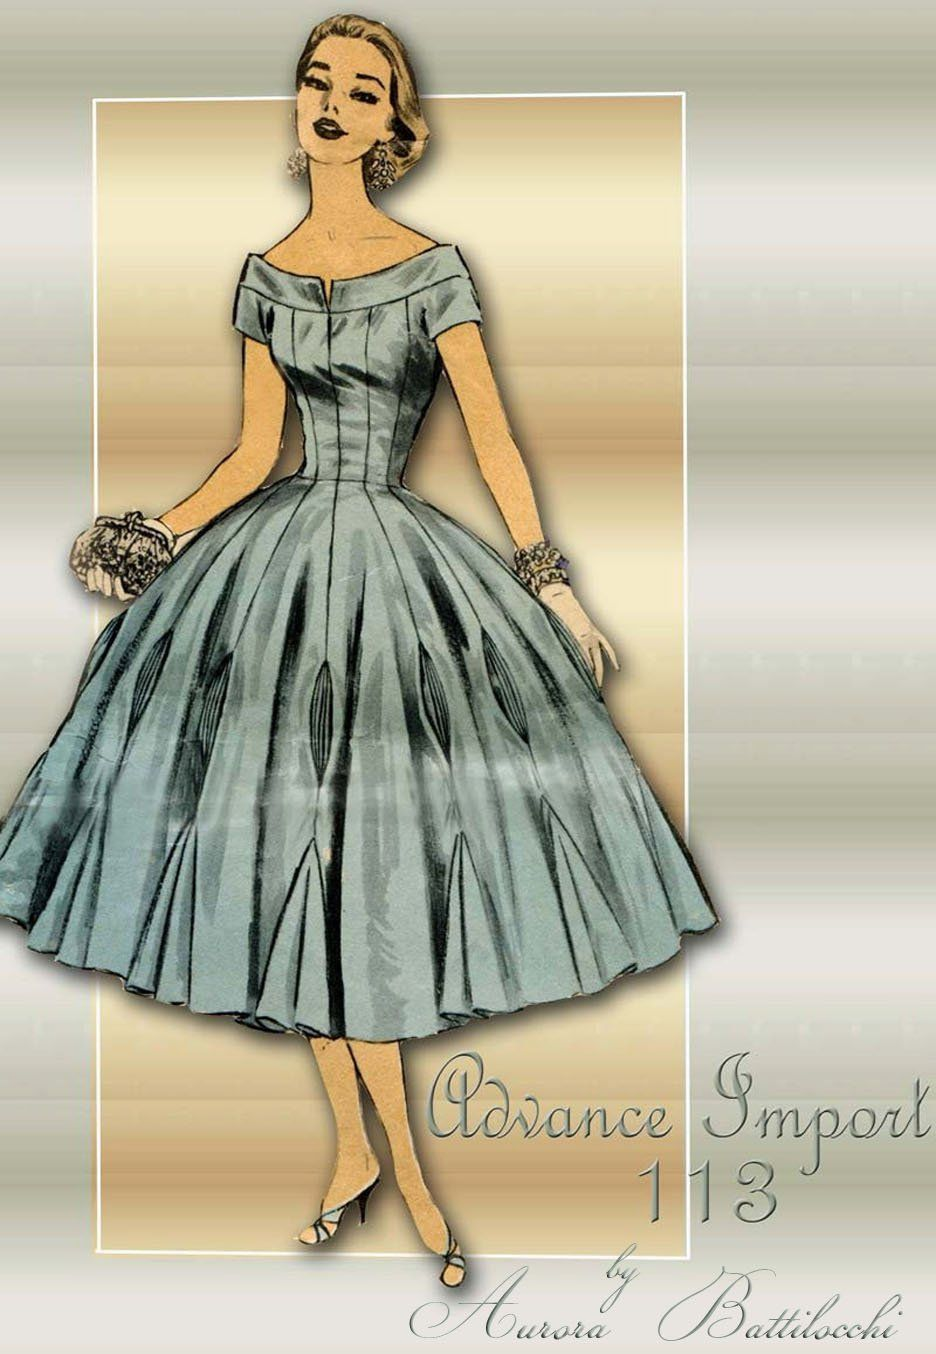 1950s Sewing Pattern Advance Import 113 Designer Cocktail Dress By Aurora Battilocchi Designer Cocktail Dress 1950s Dress Patterns 1950s Cocktail Dress [ 1354 x 936 Pixel ]